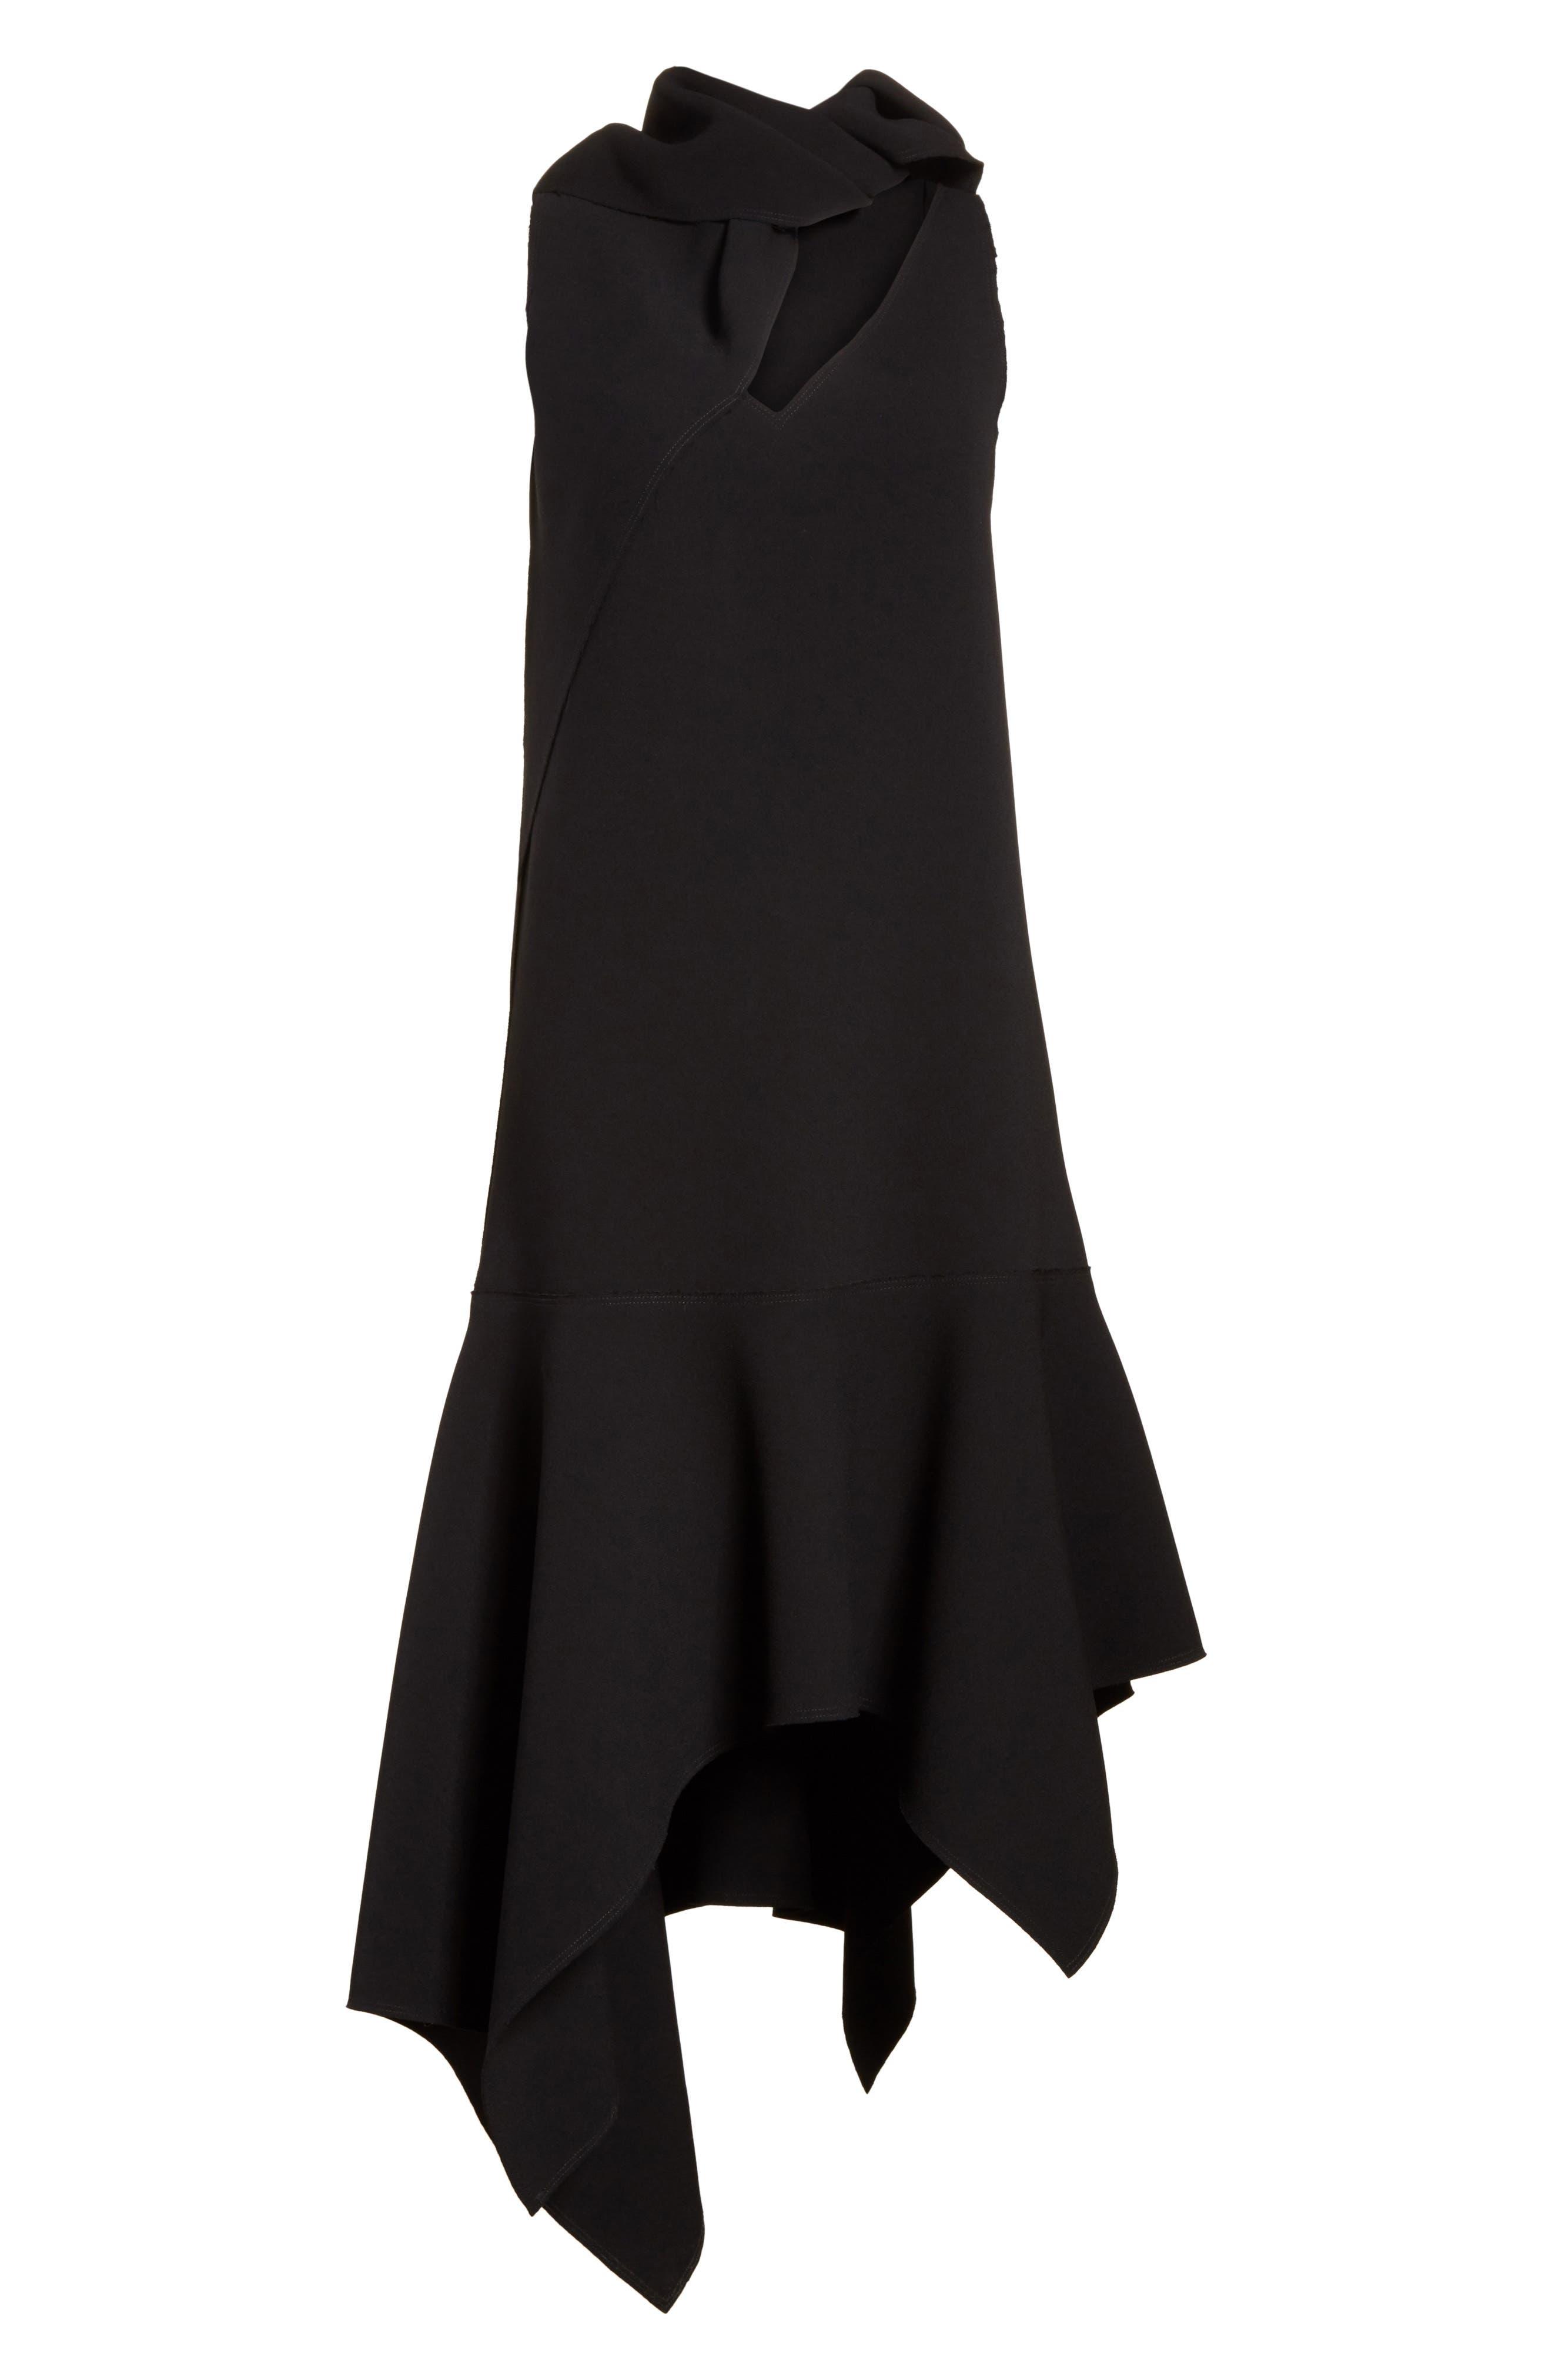 Knotted Neckline Drop Waist Dress,                             Alternate thumbnail 6, color,                             001